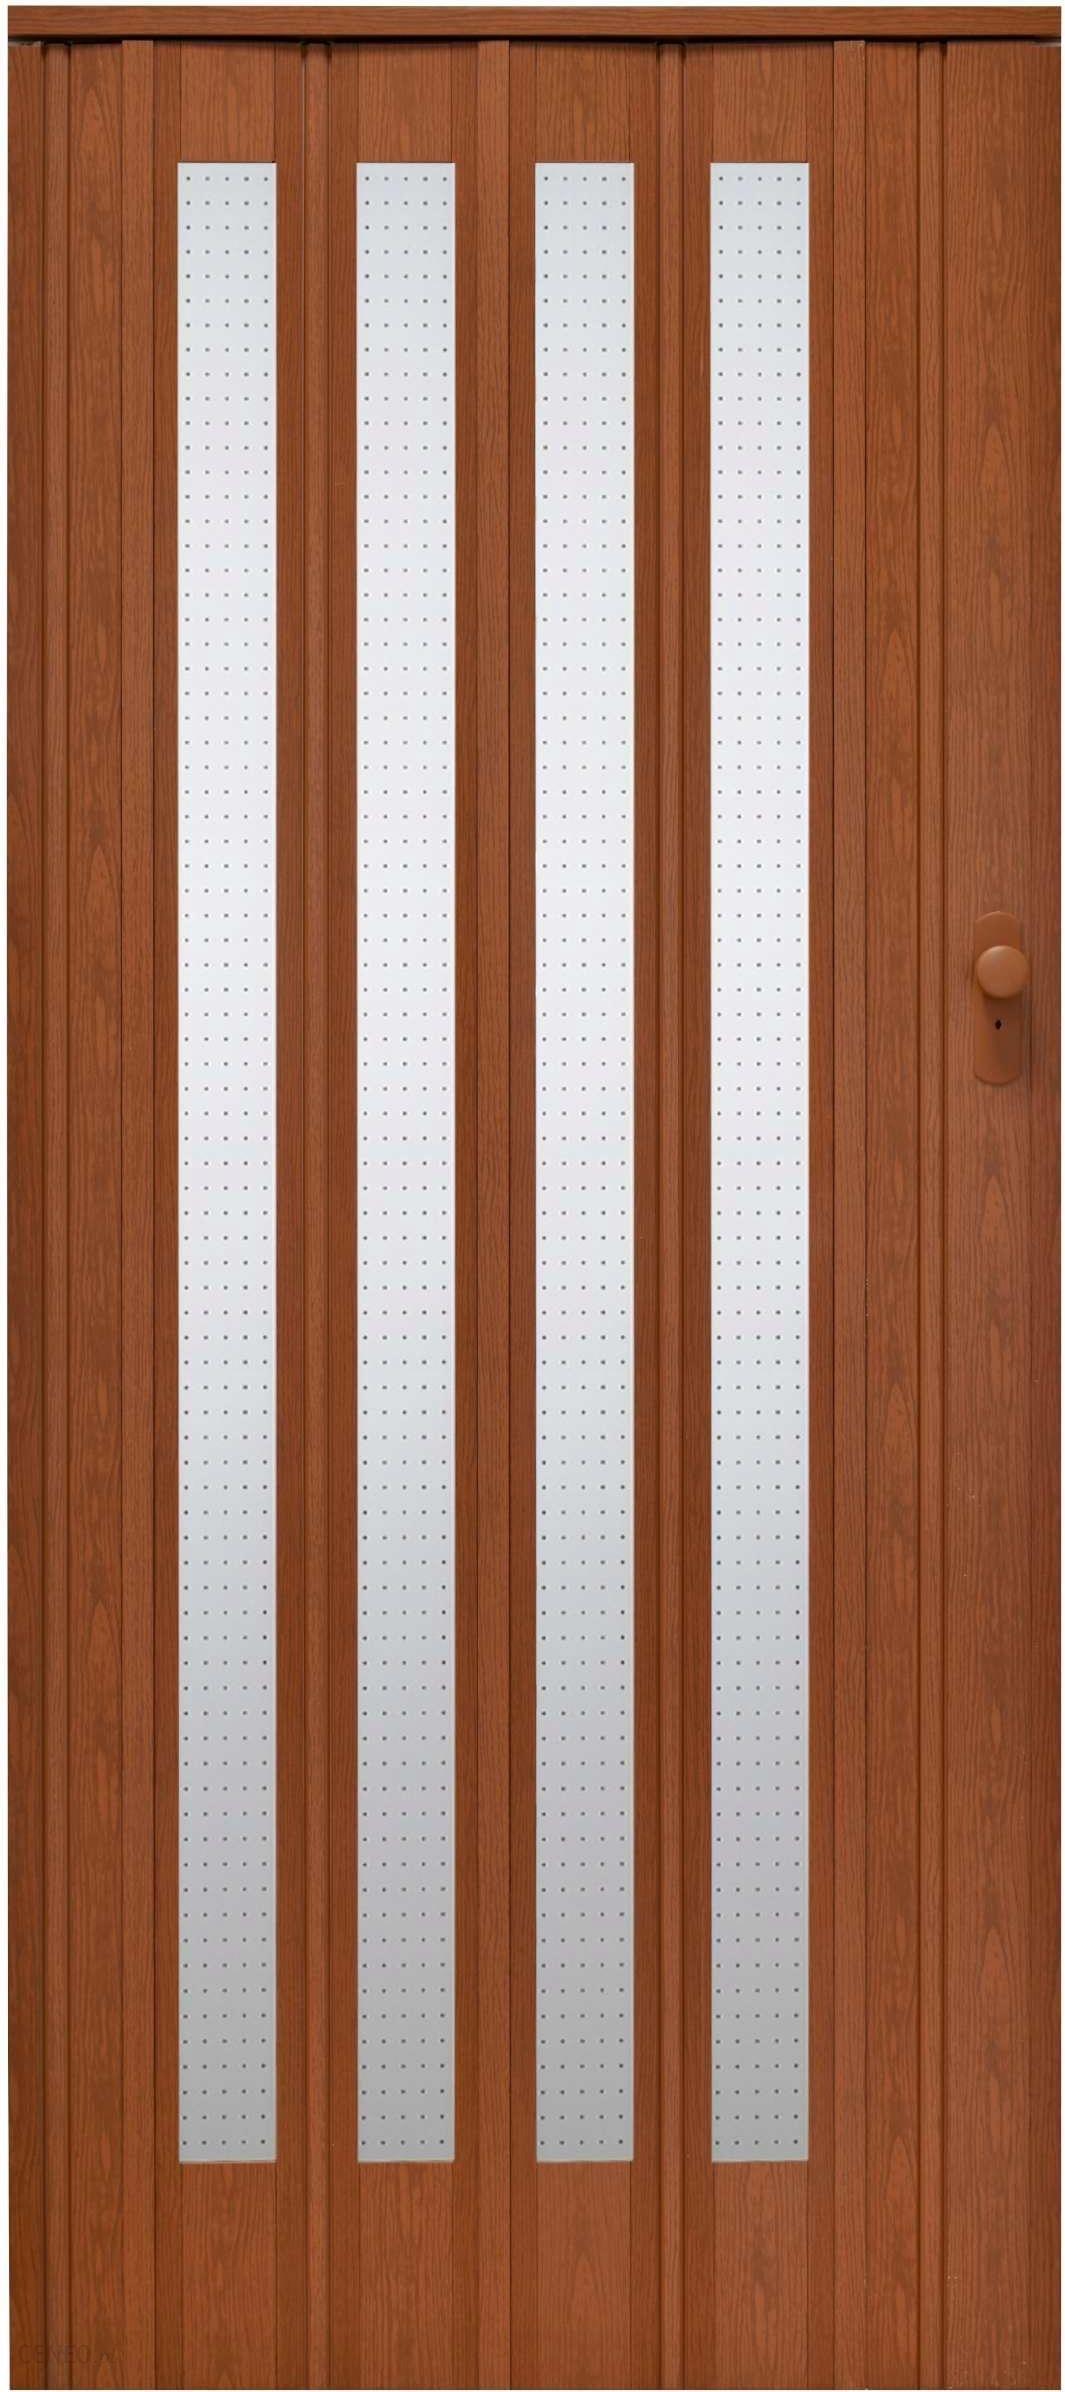 Gockowiak Drzwi Harmonijkowe 015 B02 272 Calvados Mat 86